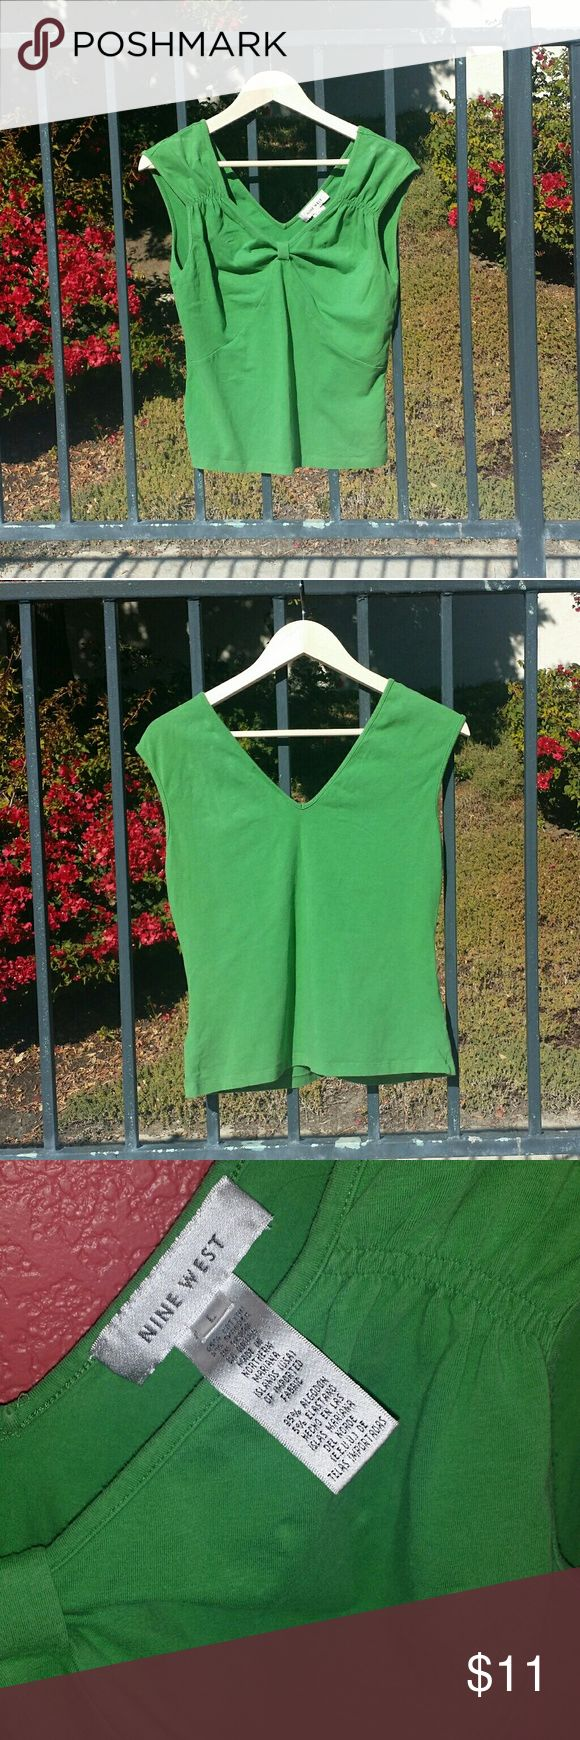 Nine West T-Shirt Cute v-neck green t-shirt by Nine West. Nine West Tops Tees - Short Sleeve